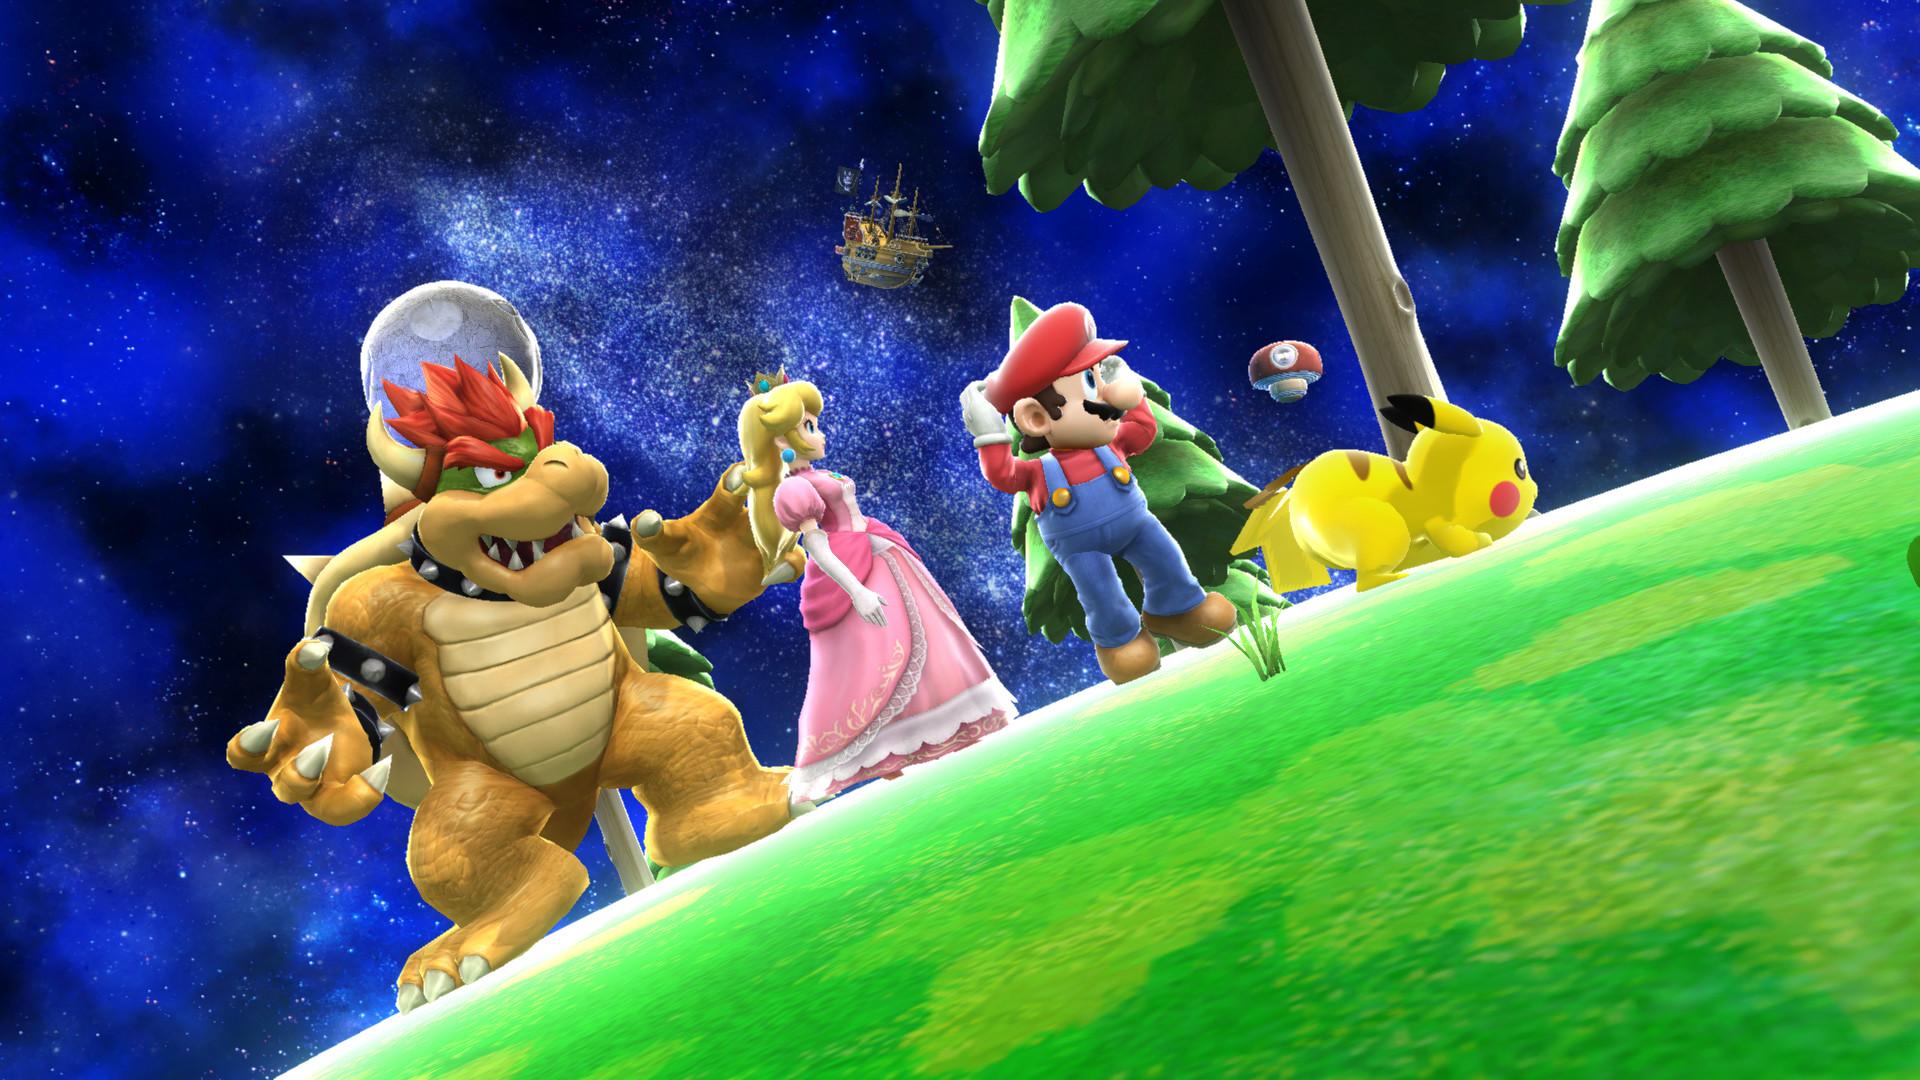 … Mario, Peach, Bowser, and Pikachu Smash Bros by Rosalina-Luma